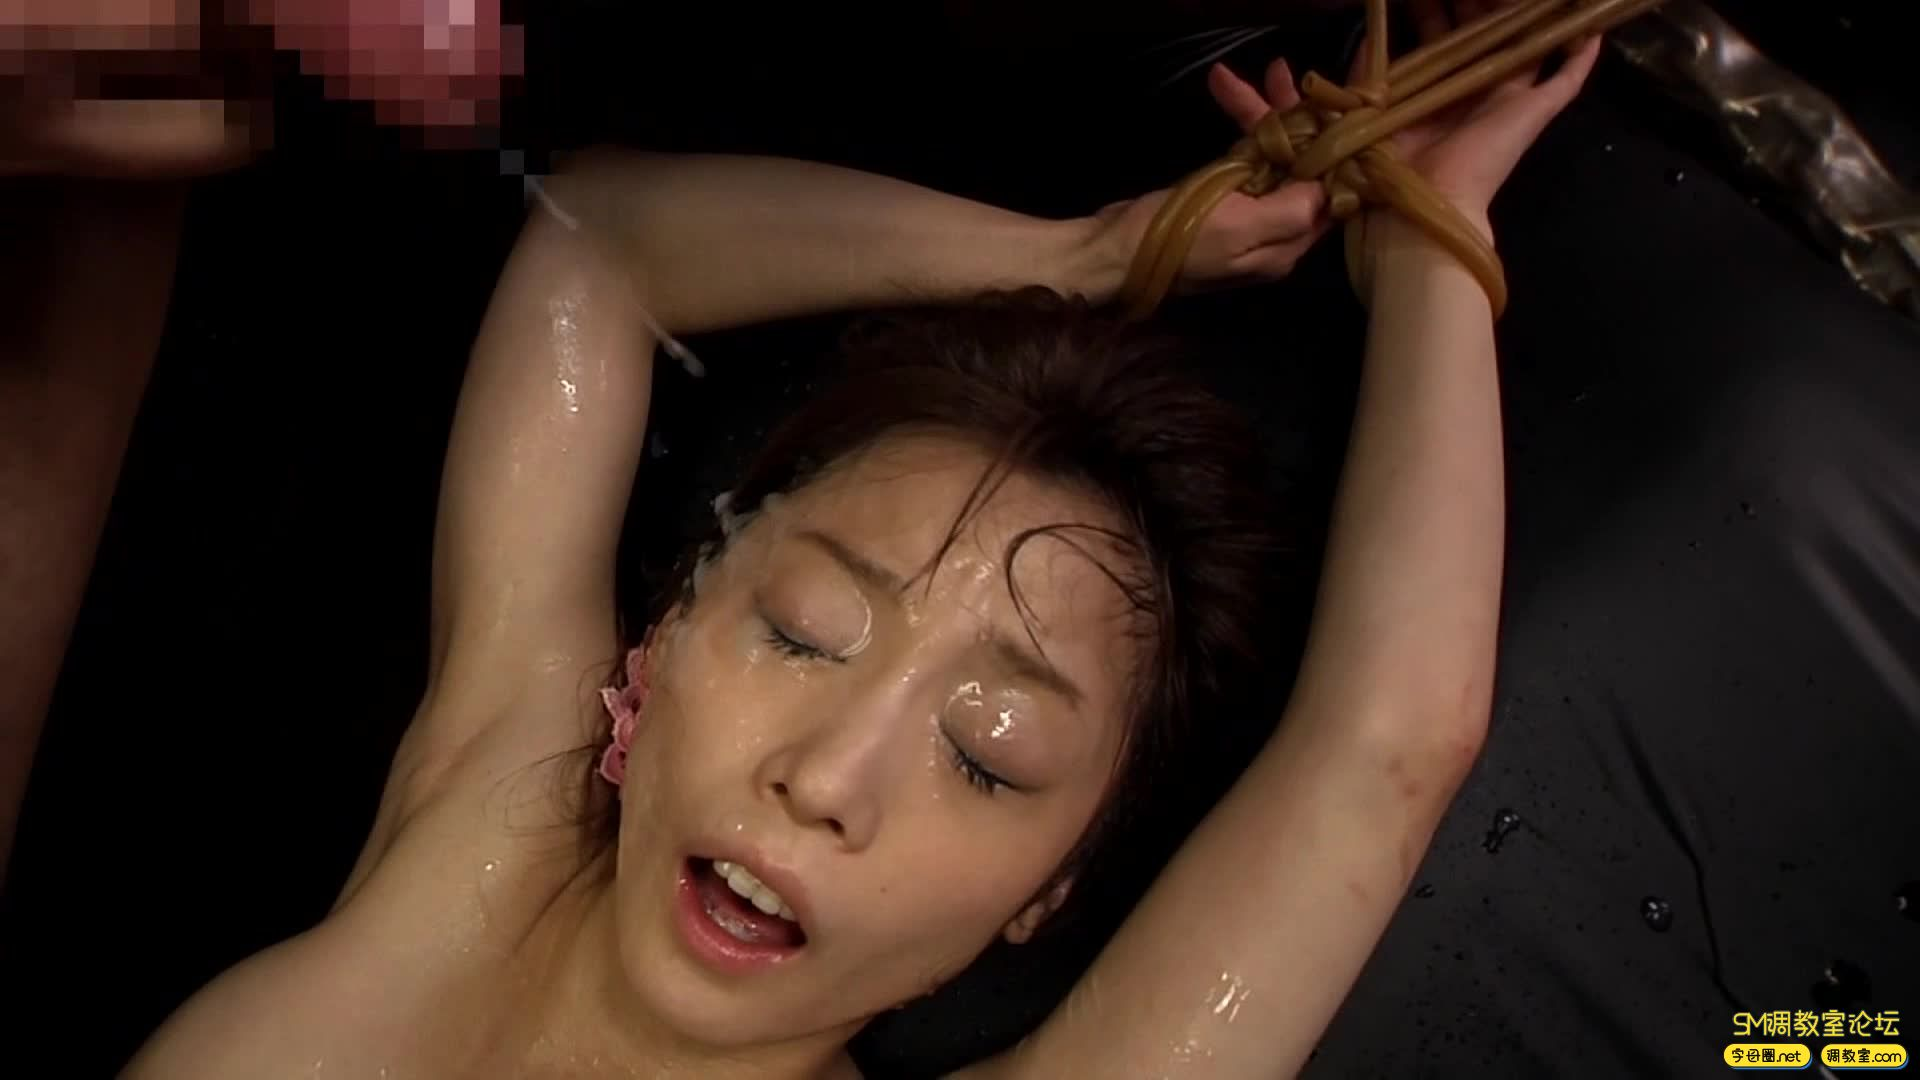 [Dogma合集] - NTJ-004 - 穴奴隷介護士 樹花凜-视频截图7